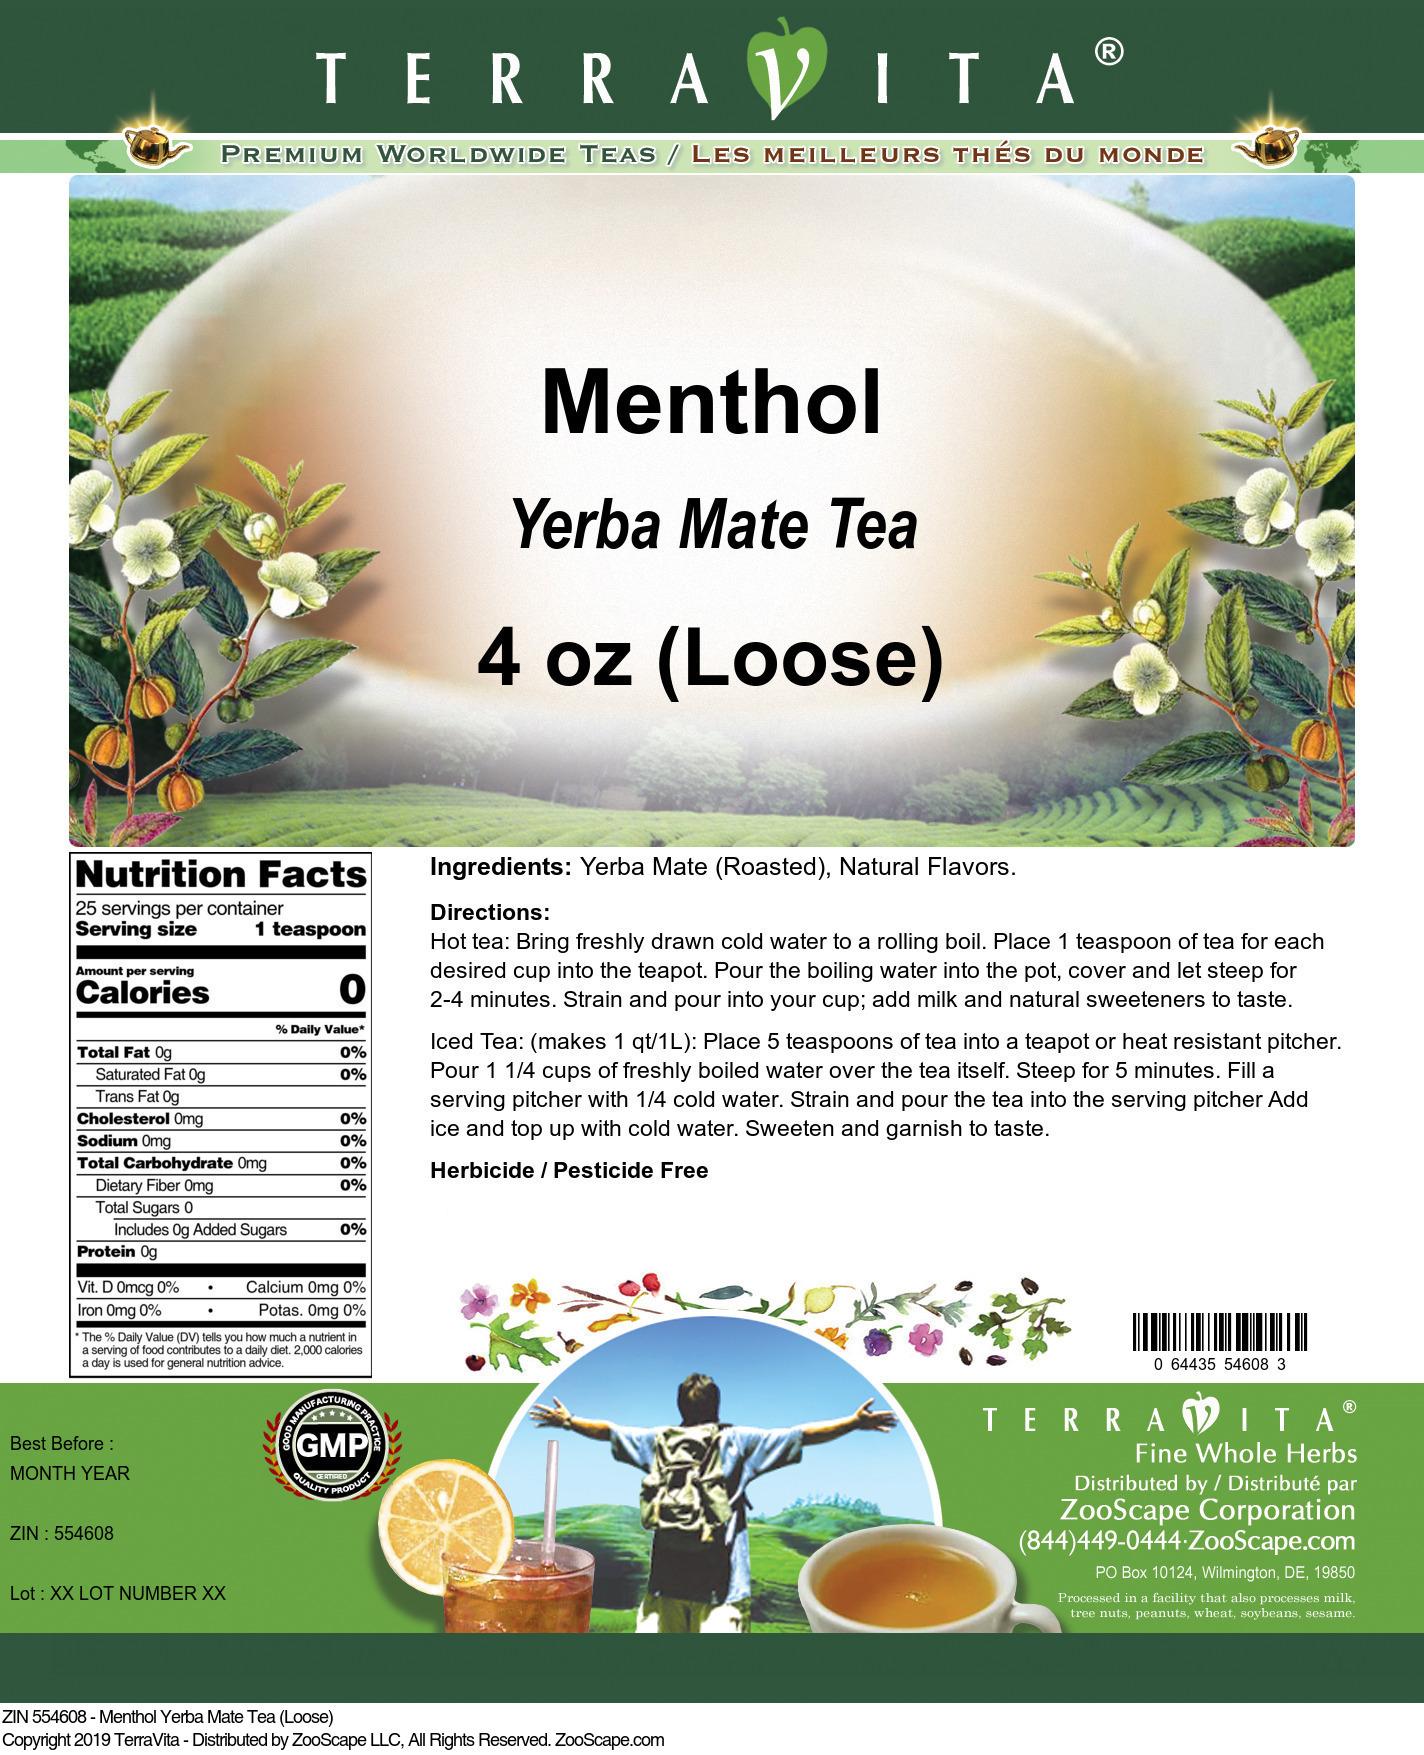 Menthol Yerba Mate Tea (Loose)